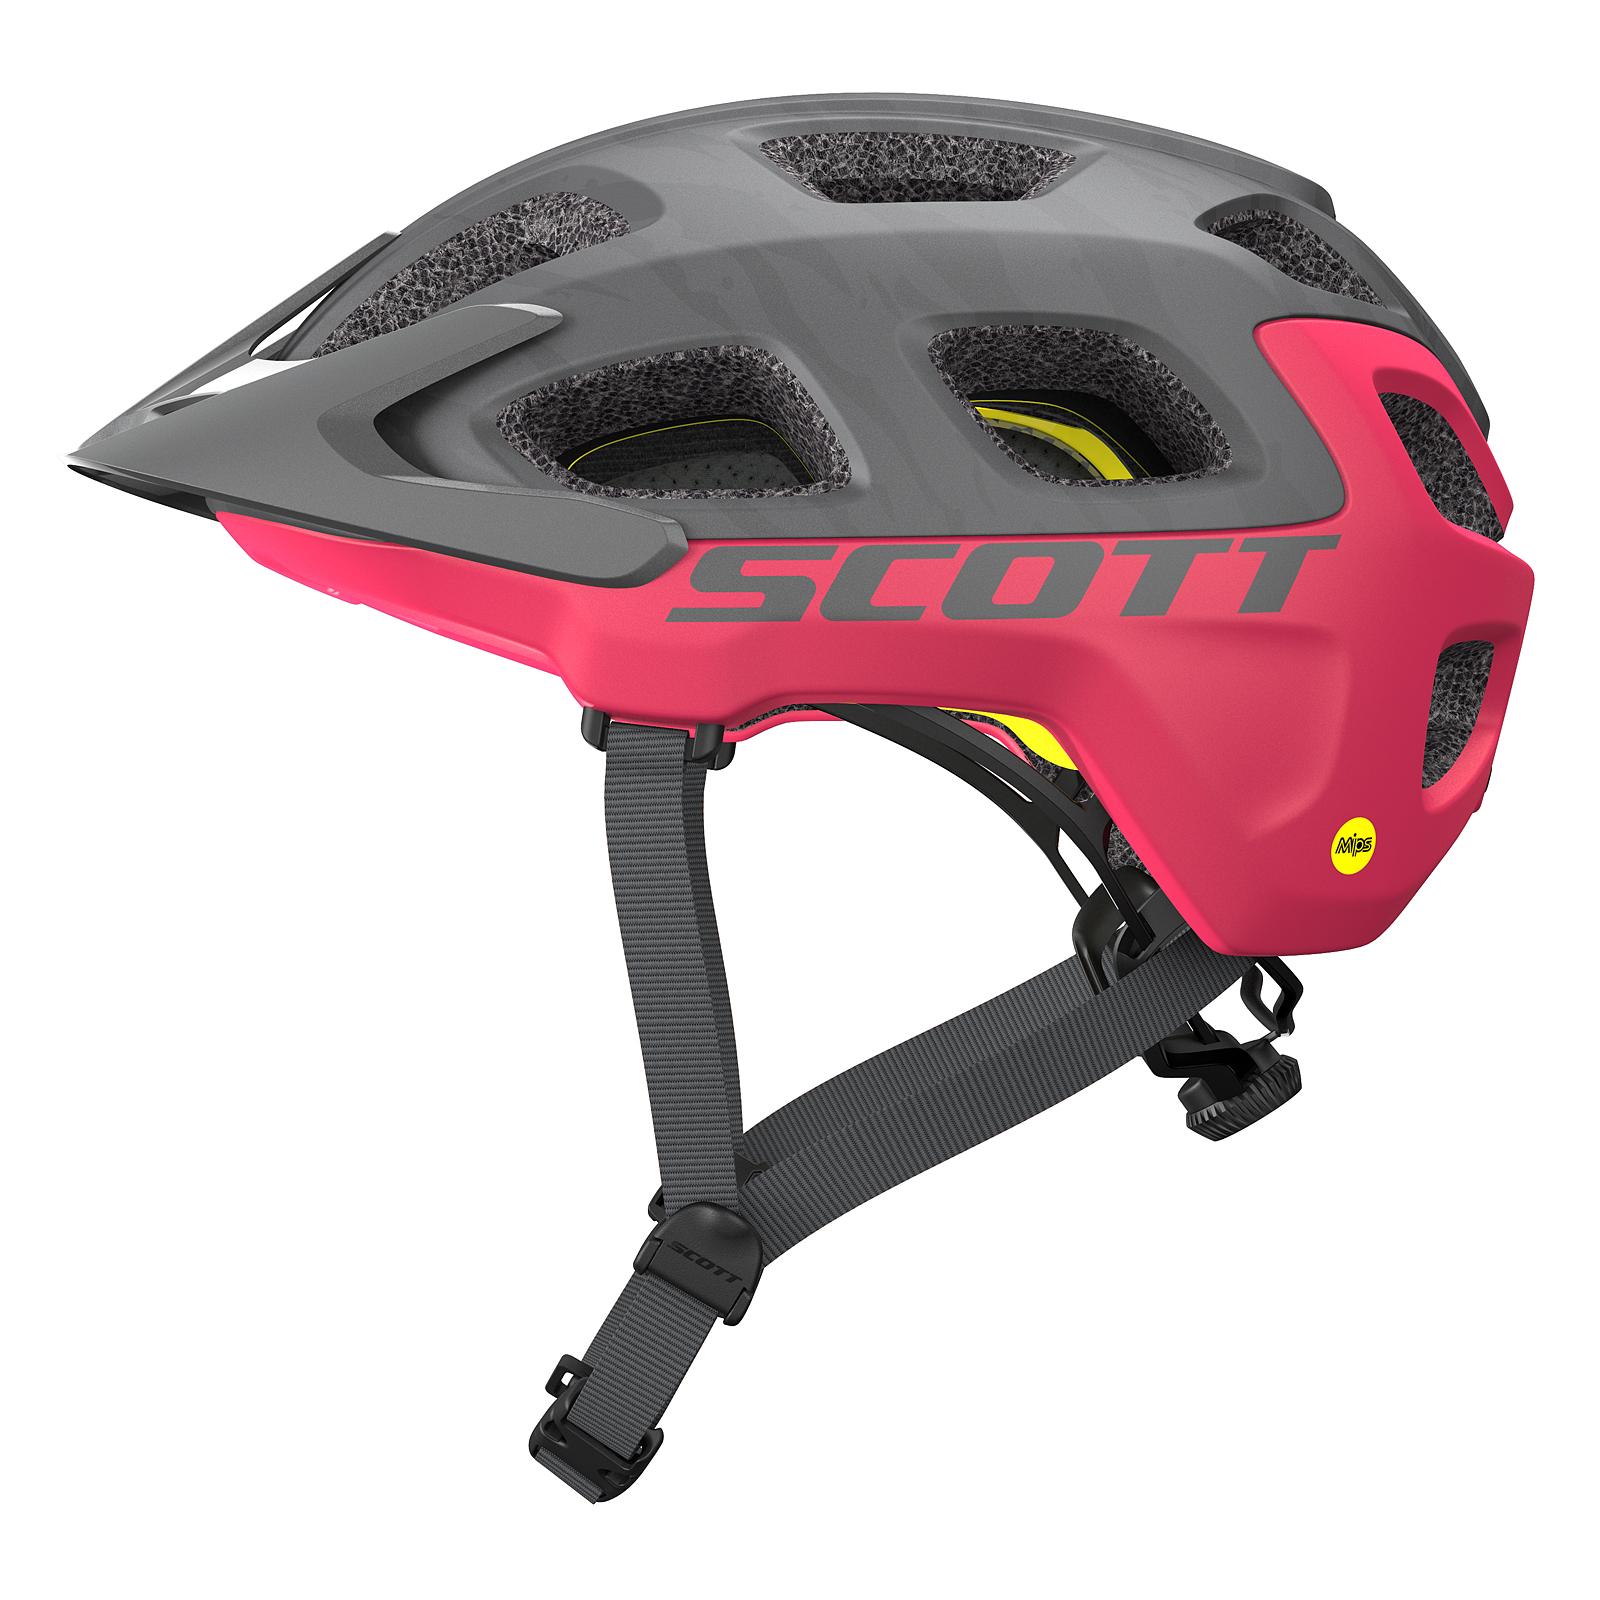 scott vivo plus mtb fahrrad helm grau pink 2018 von top. Black Bedroom Furniture Sets. Home Design Ideas